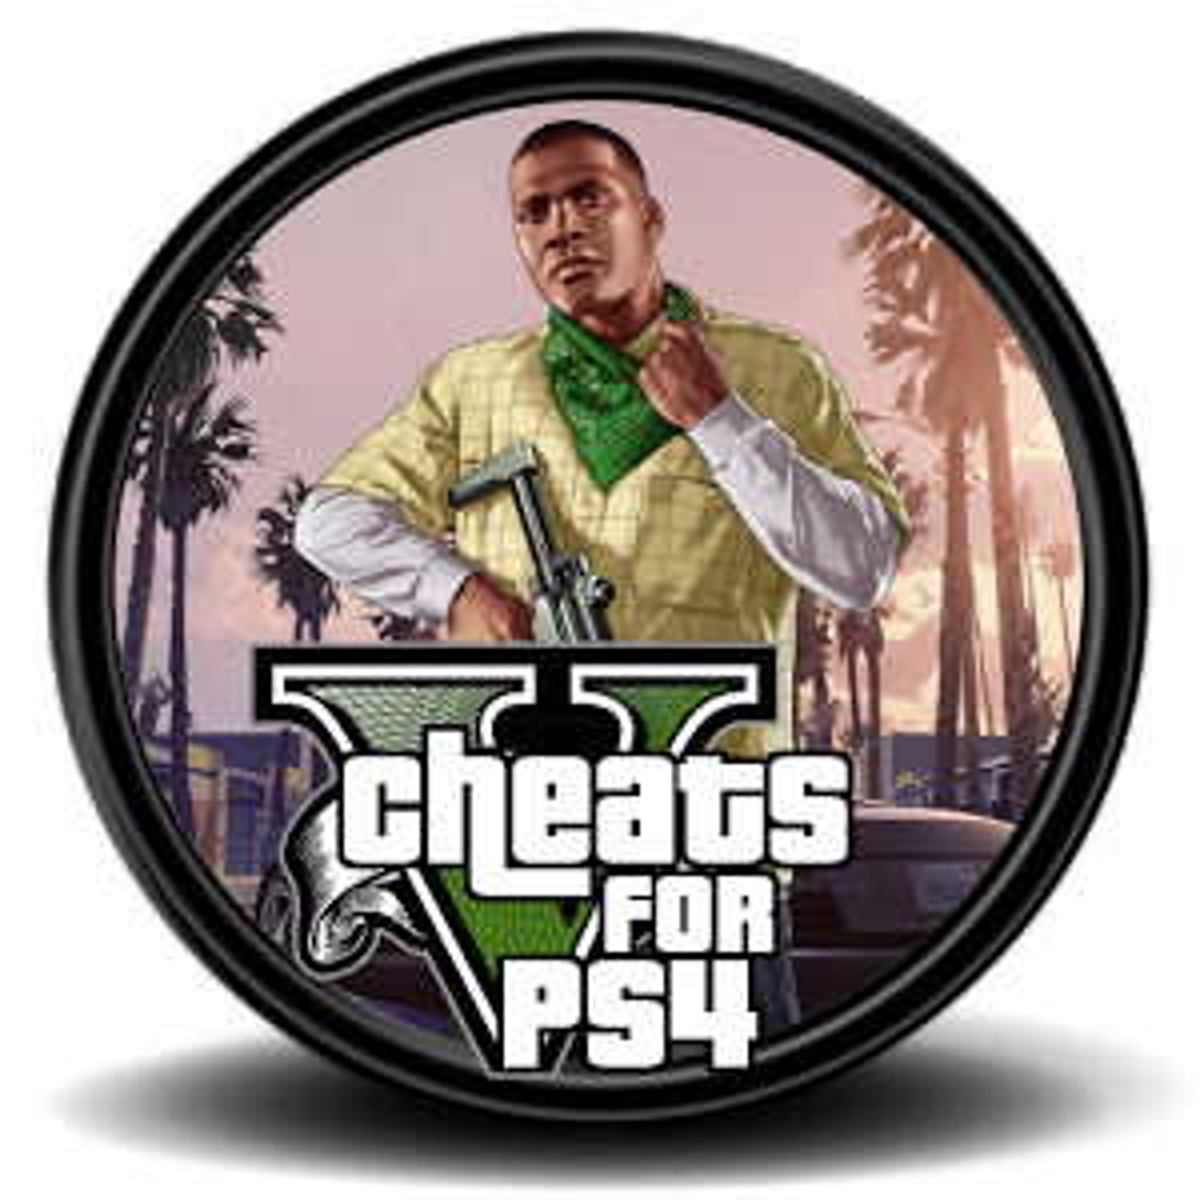 Cheats GTA 5 for PS4 (Xbox/PC) 1.2.7